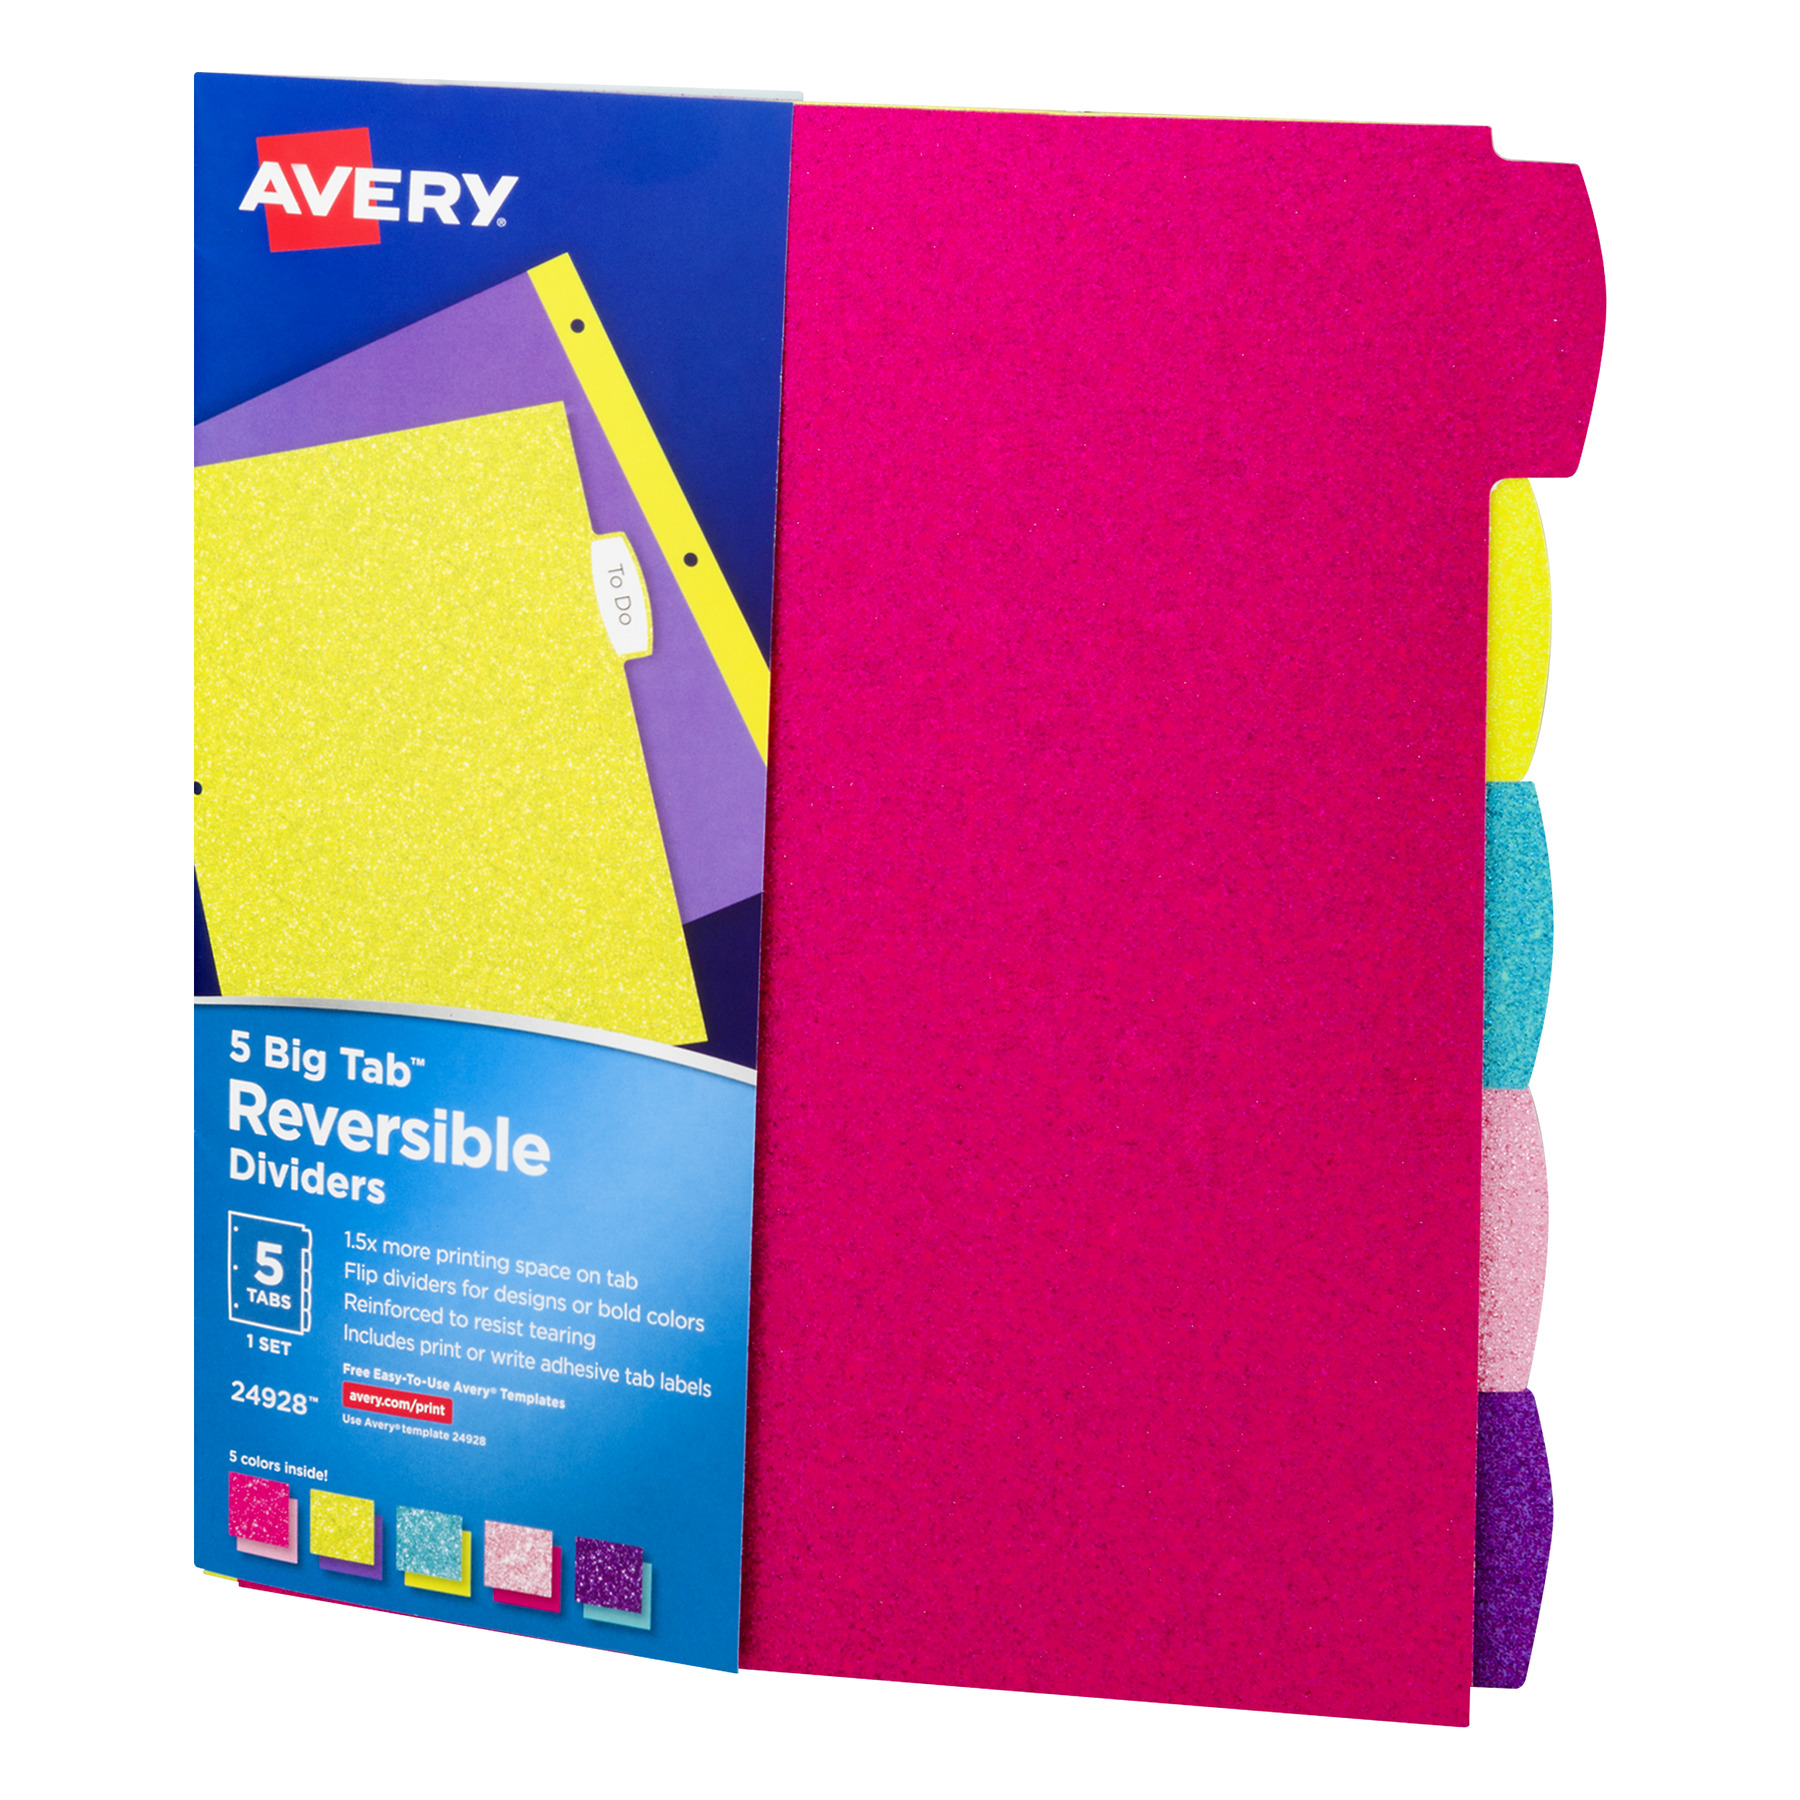 avery big tab reversible fashion dividers 5 tab set glitter assorted colors 24928 walmartcom